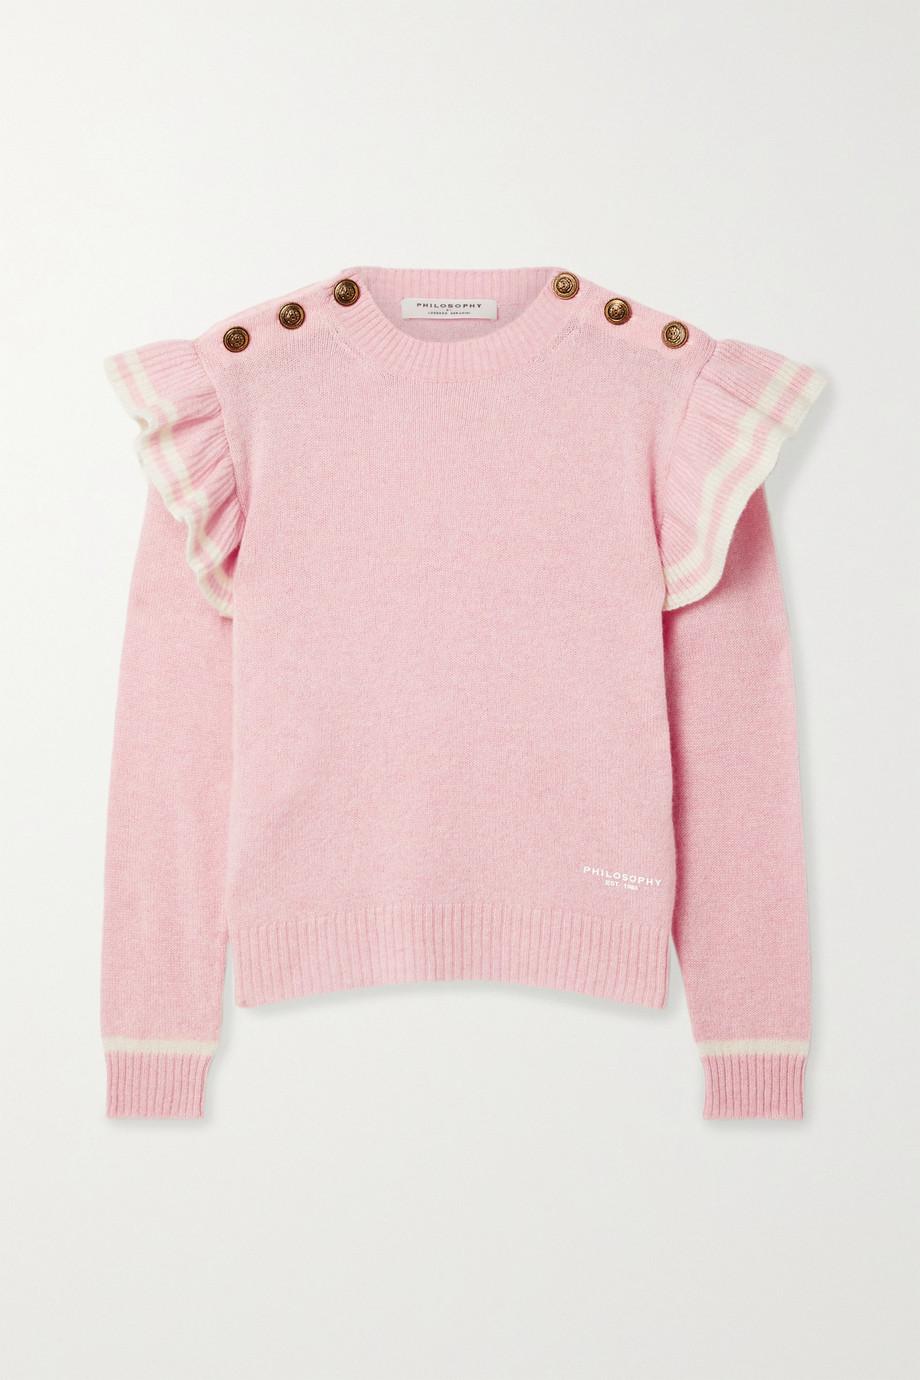 Philosophy di Lorenzo Serafini Ruffled striped cashmere sweater